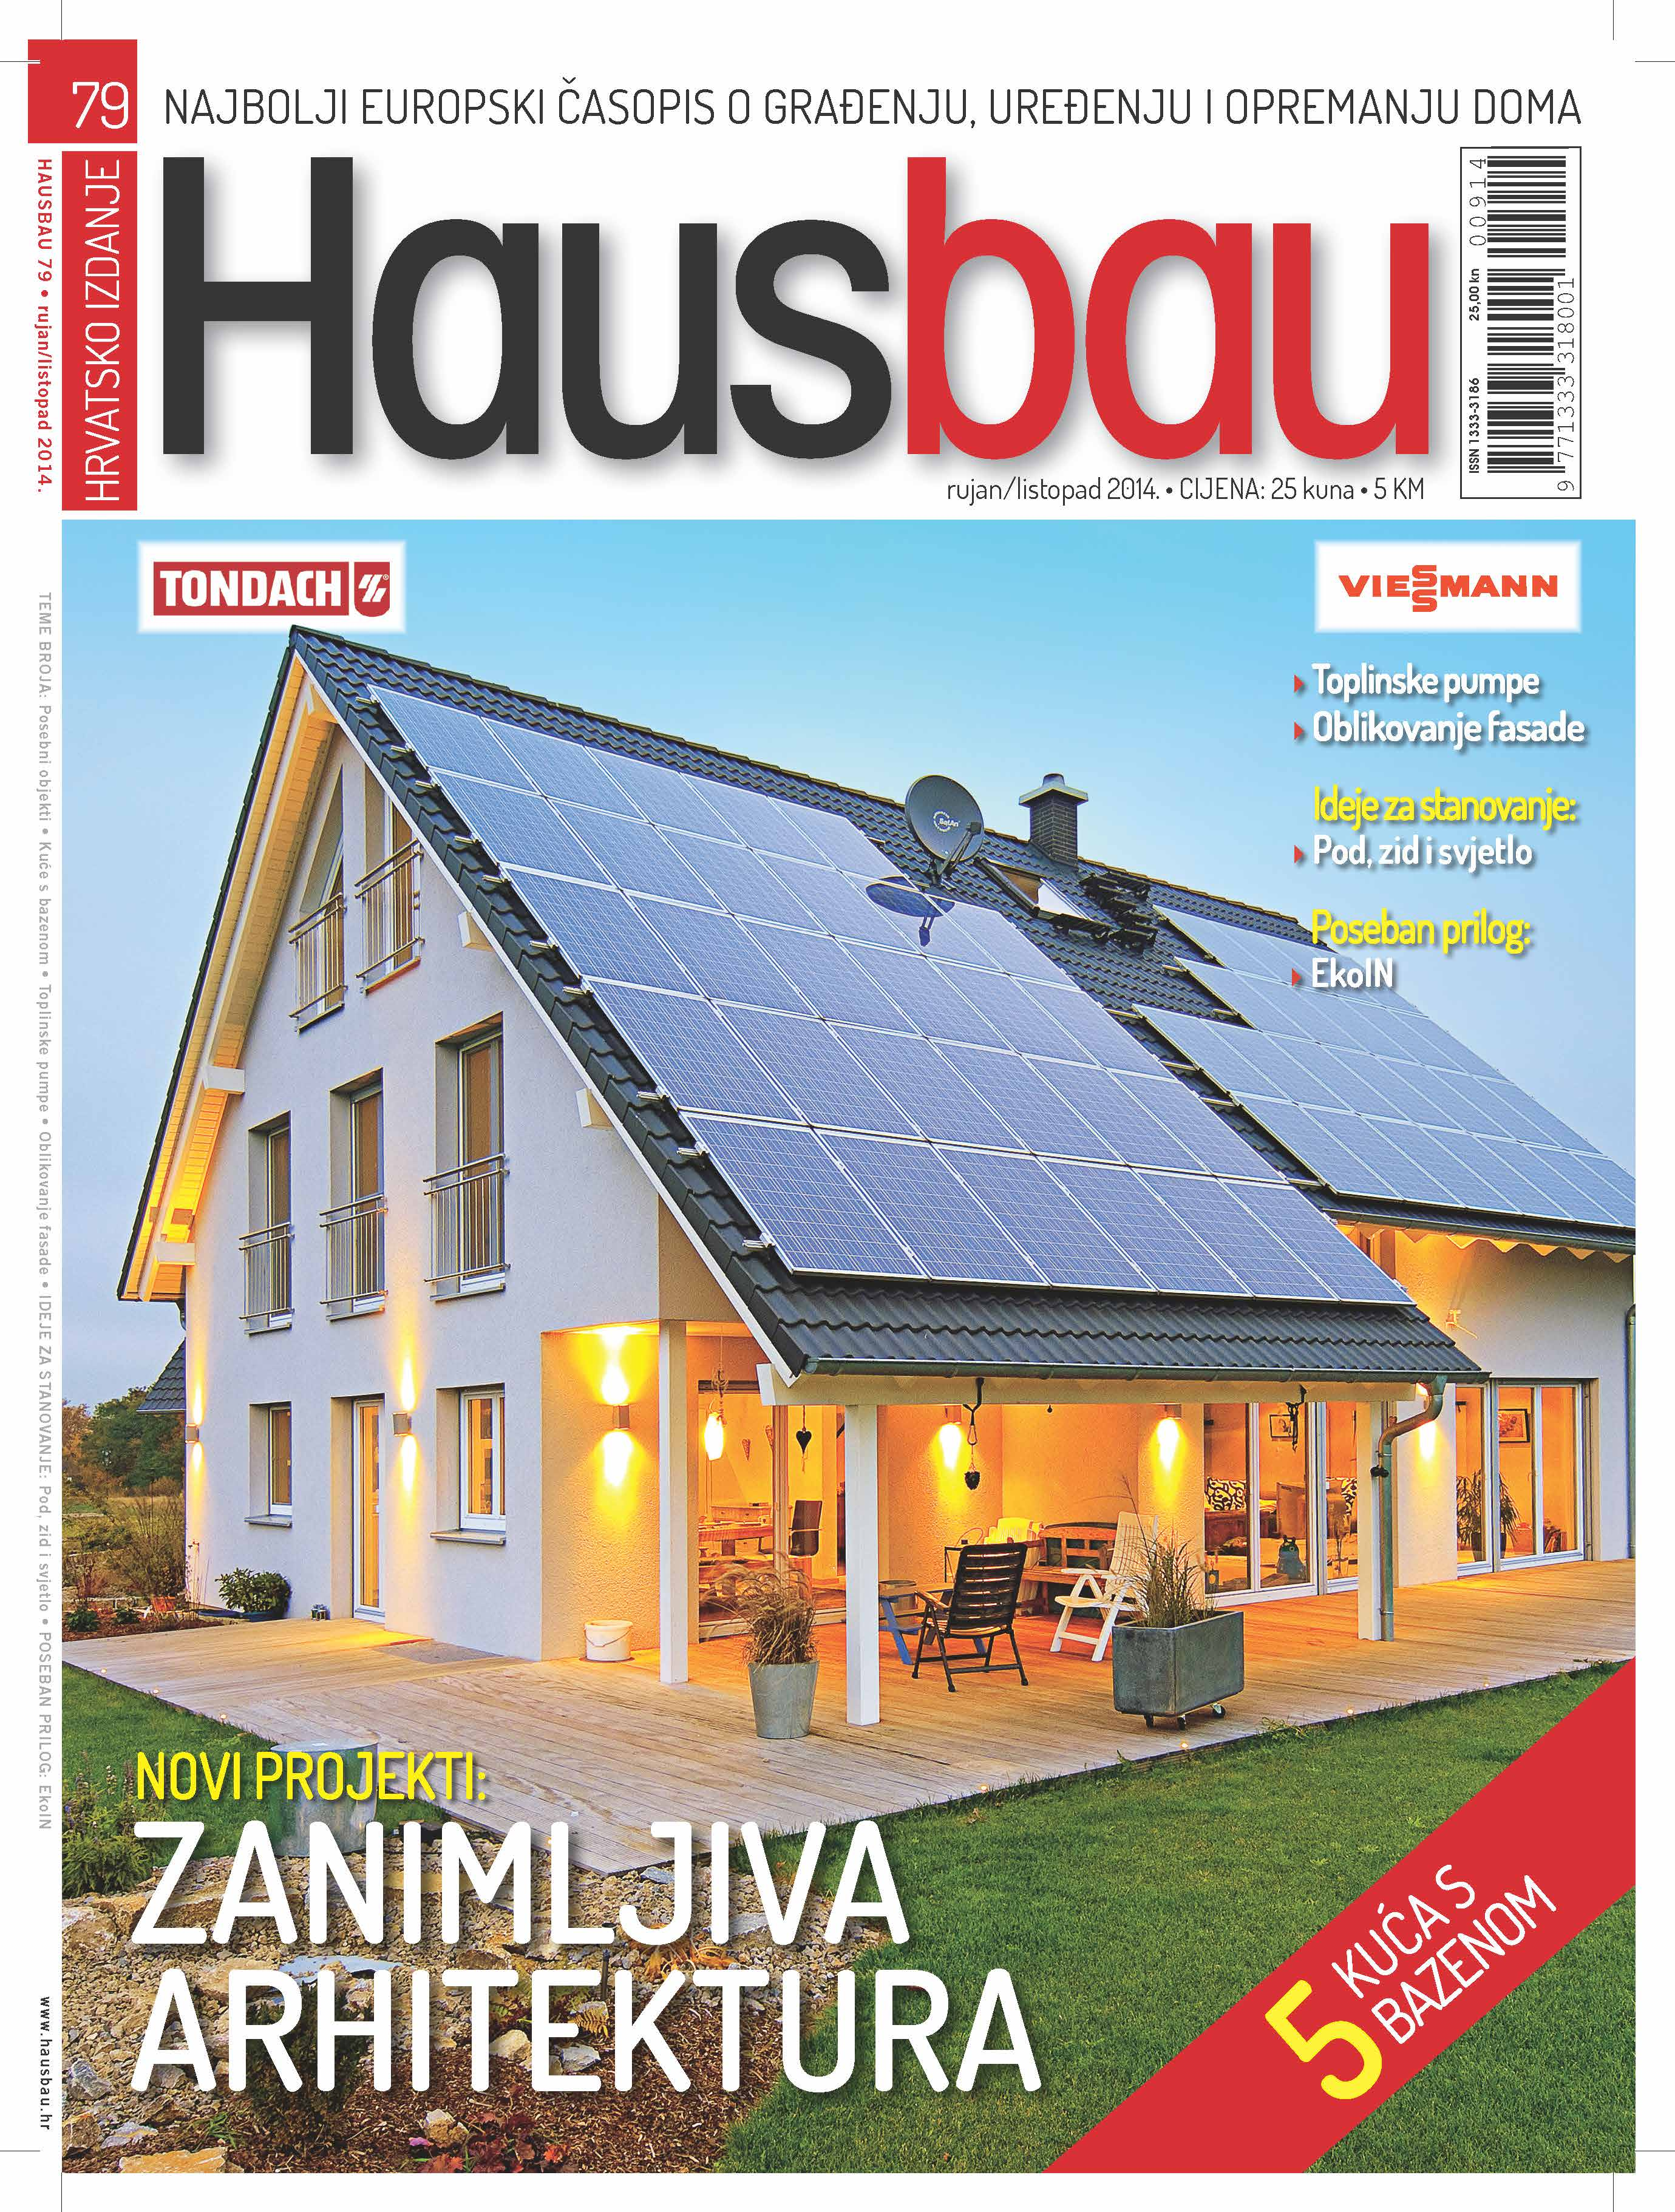 hausbau br 79 rujan listopad 2014 na svim kioscima hausbau. Black Bedroom Furniture Sets. Home Design Ideas